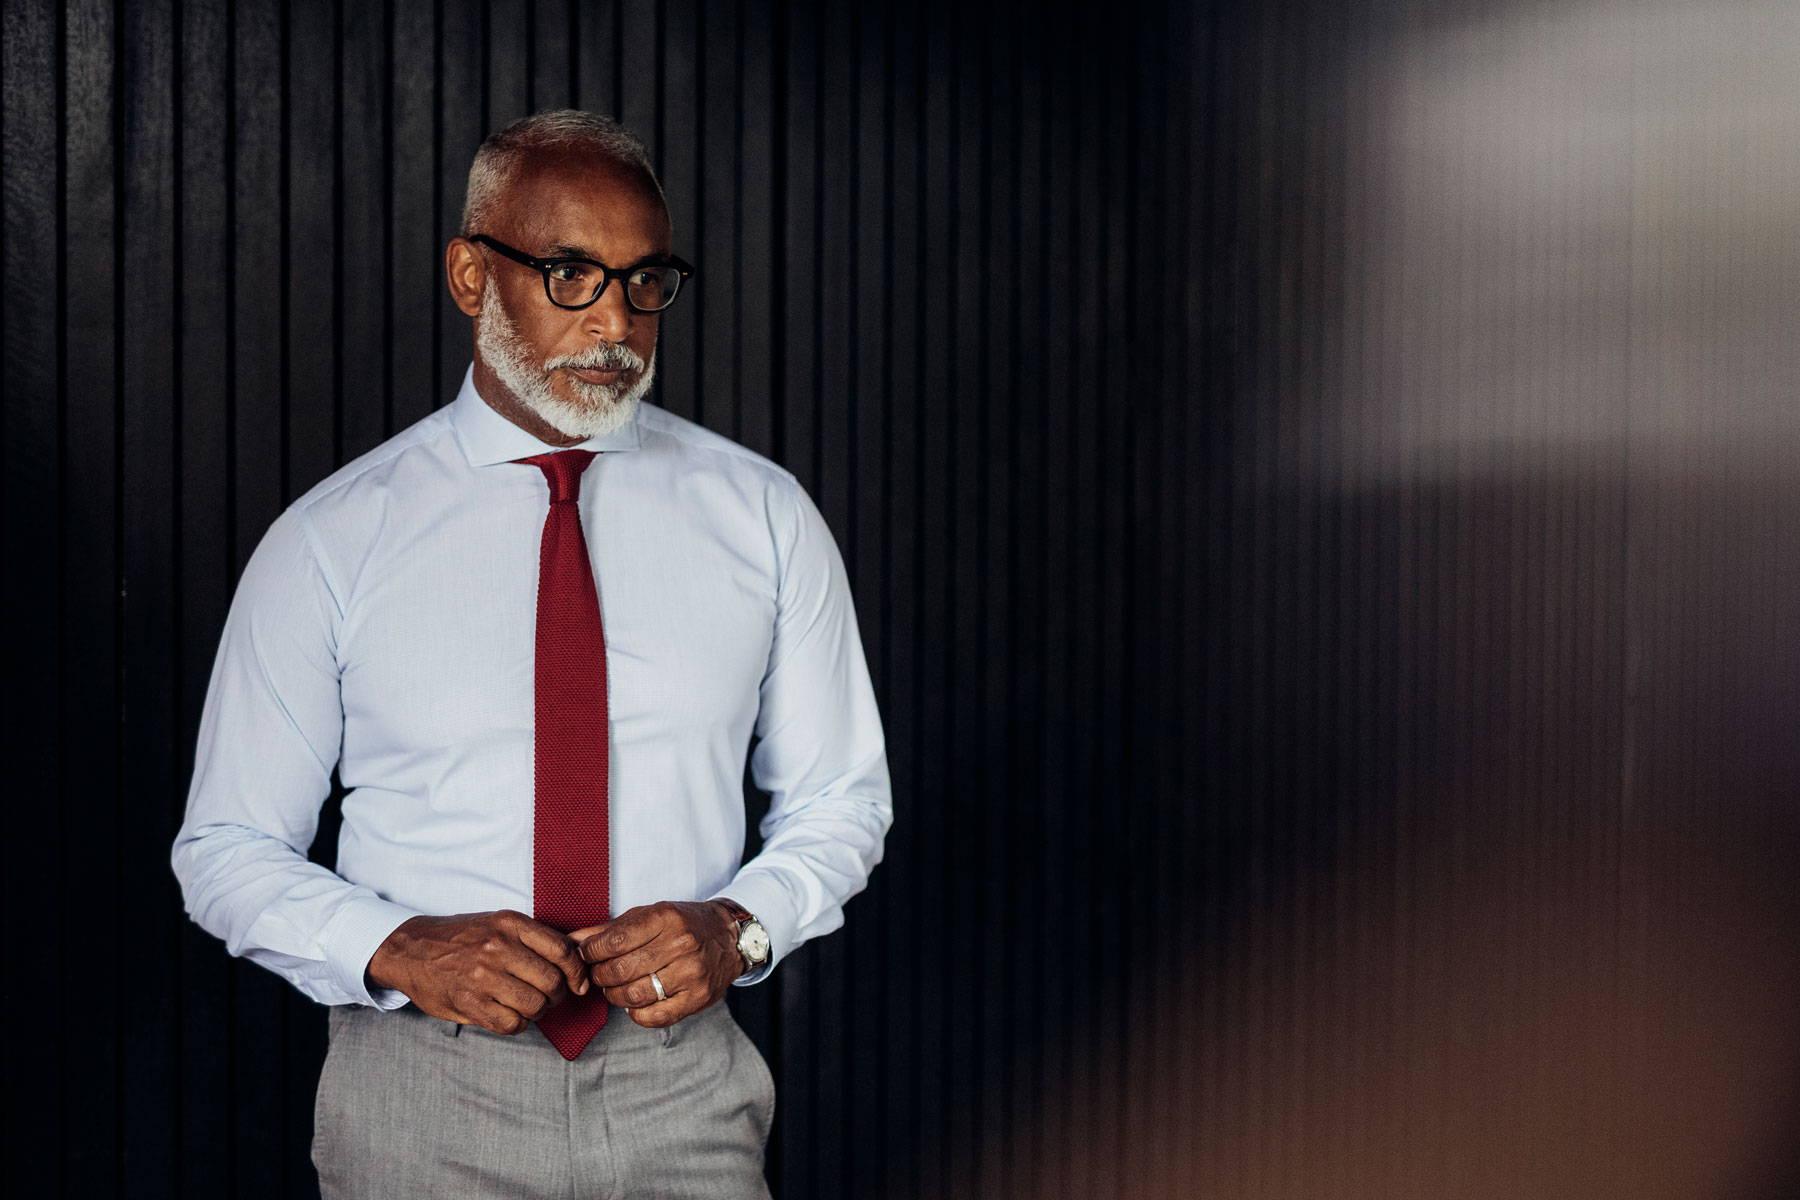 Man in light blue shirt and dark red tie